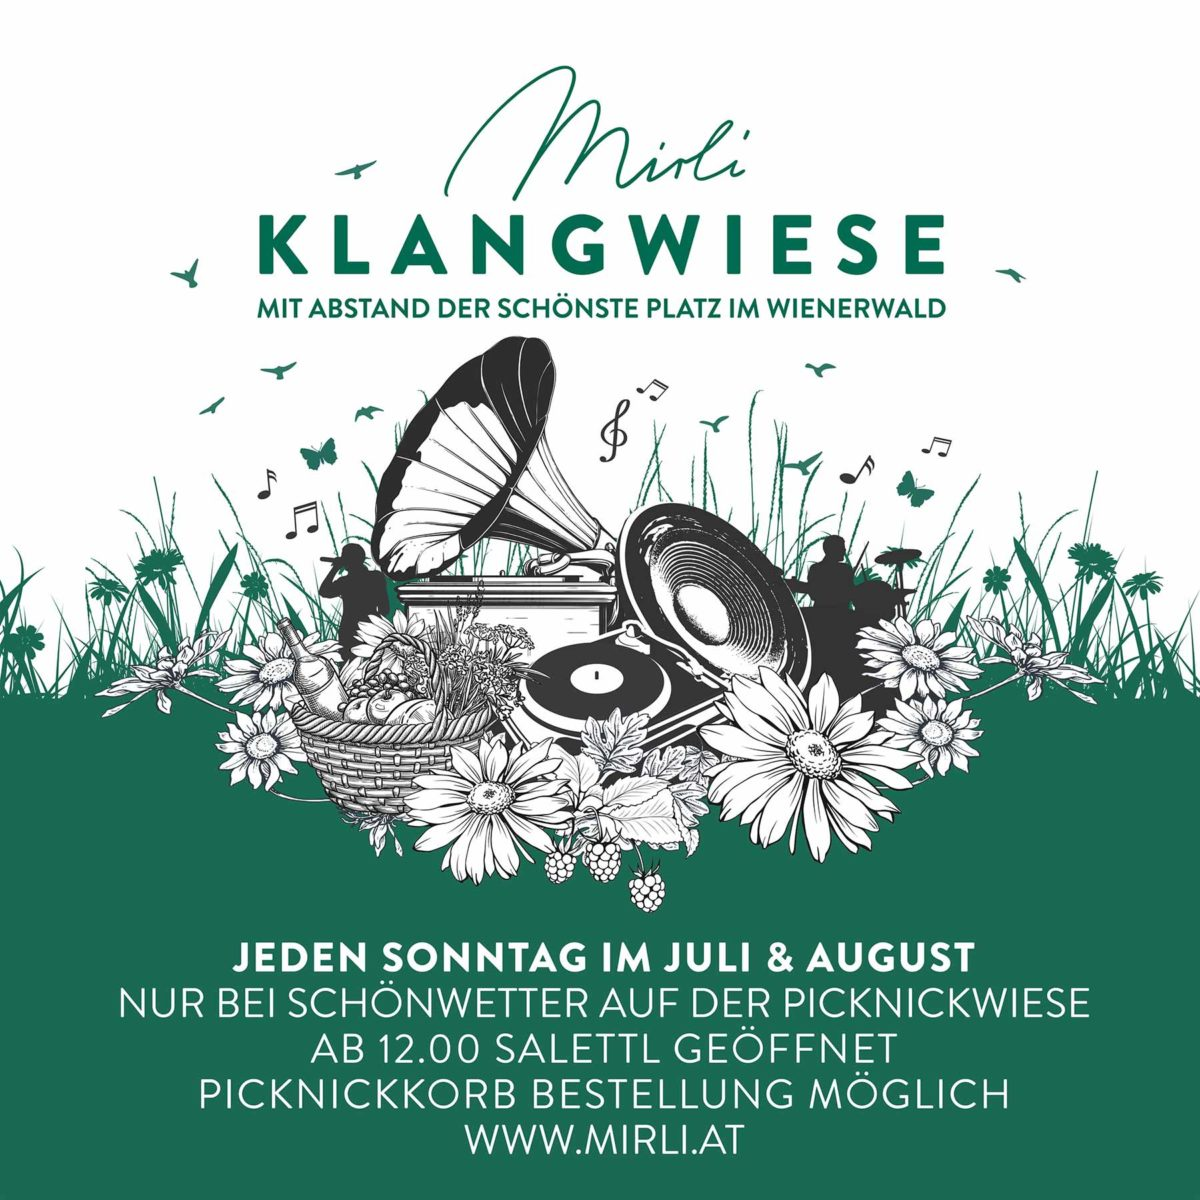 https://mirli.at/wp-content/uploads/2020/06/Mirli-Klangwiese-Visual-1200x1200.jpg